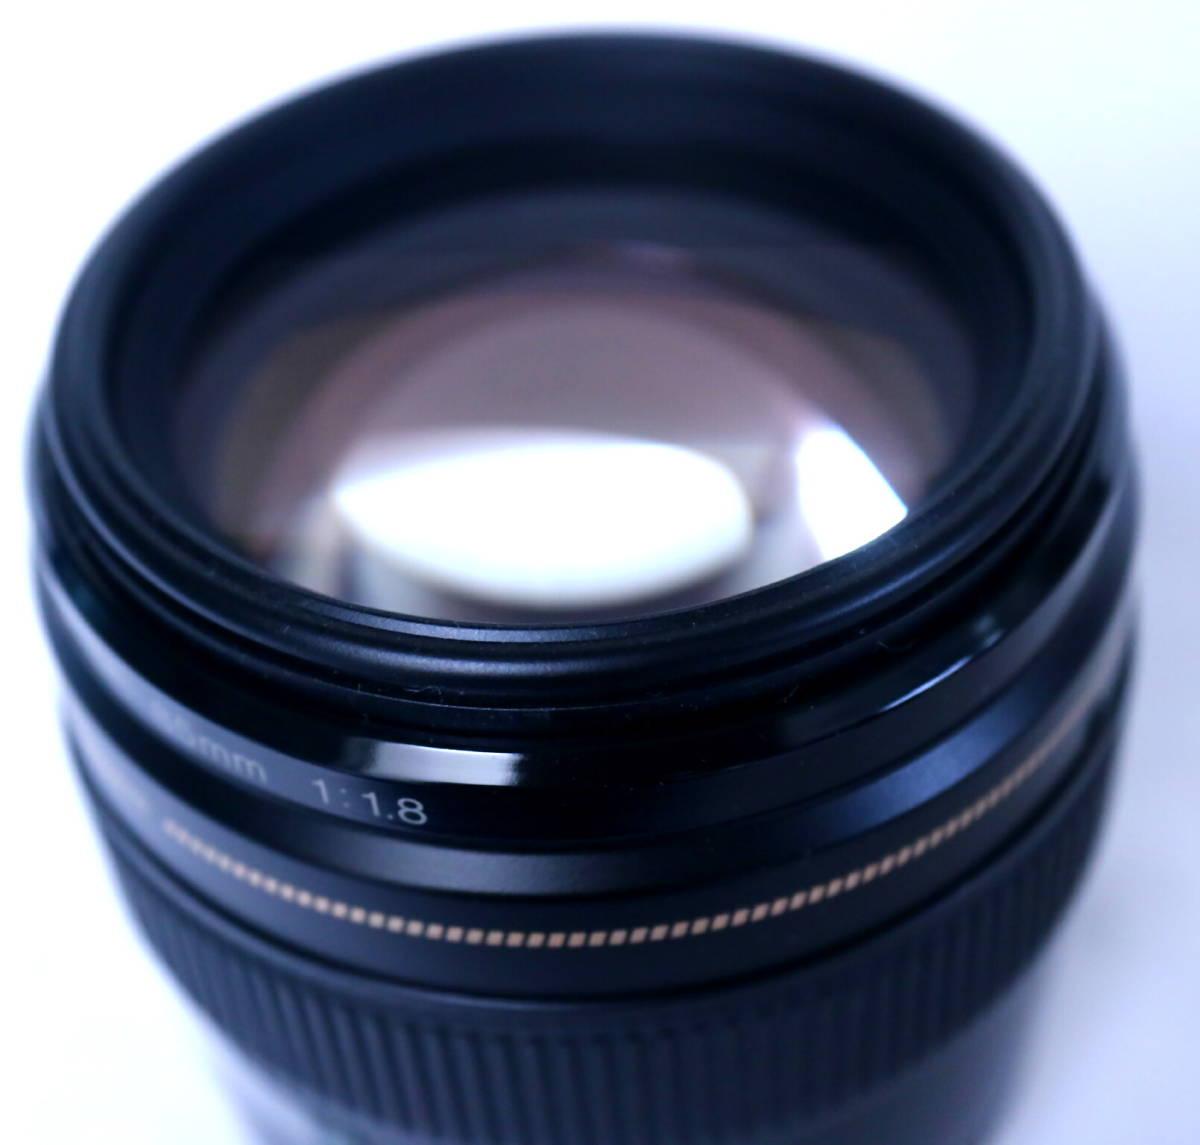 Canon EF85mm f1.8 USM 【極美品】ワンオーナー品 フルサイズ対応 高性能単焦点レンズ キヤノン_画像6